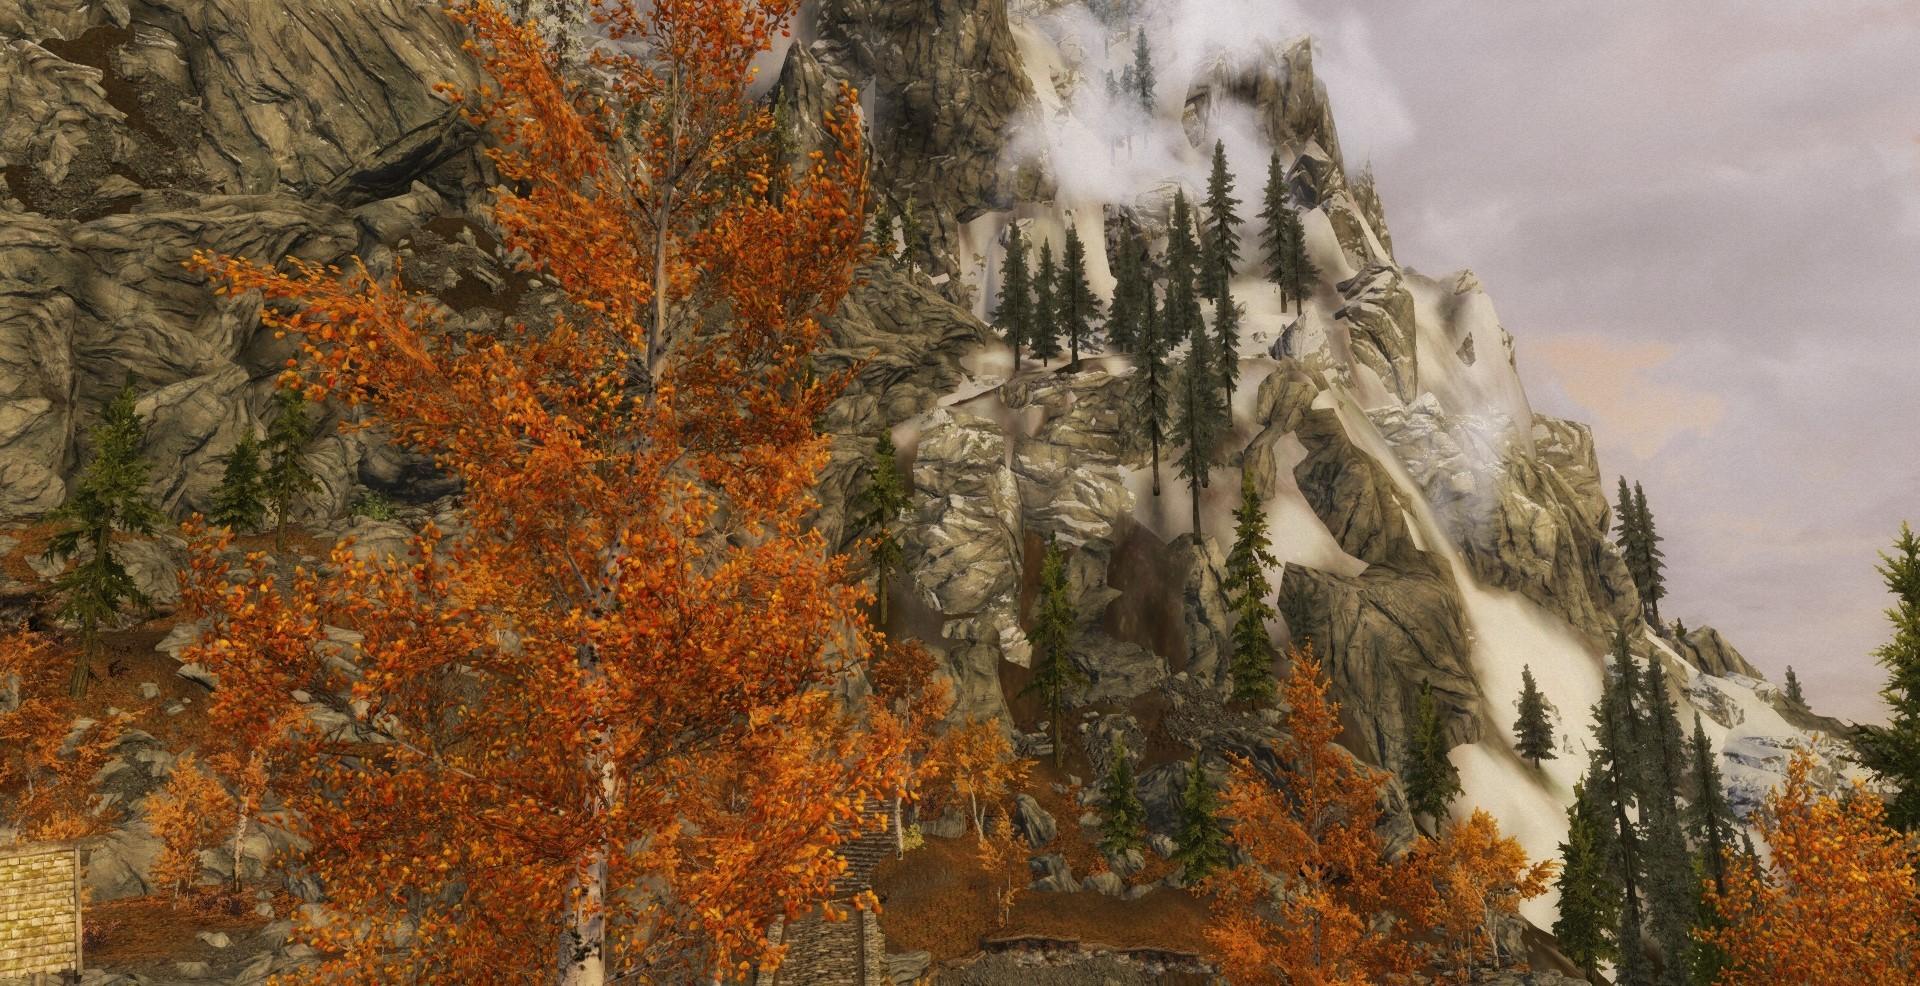 Skyrim SSE Landscapes 1– Ivarstead and Whiterun Hold – Syls